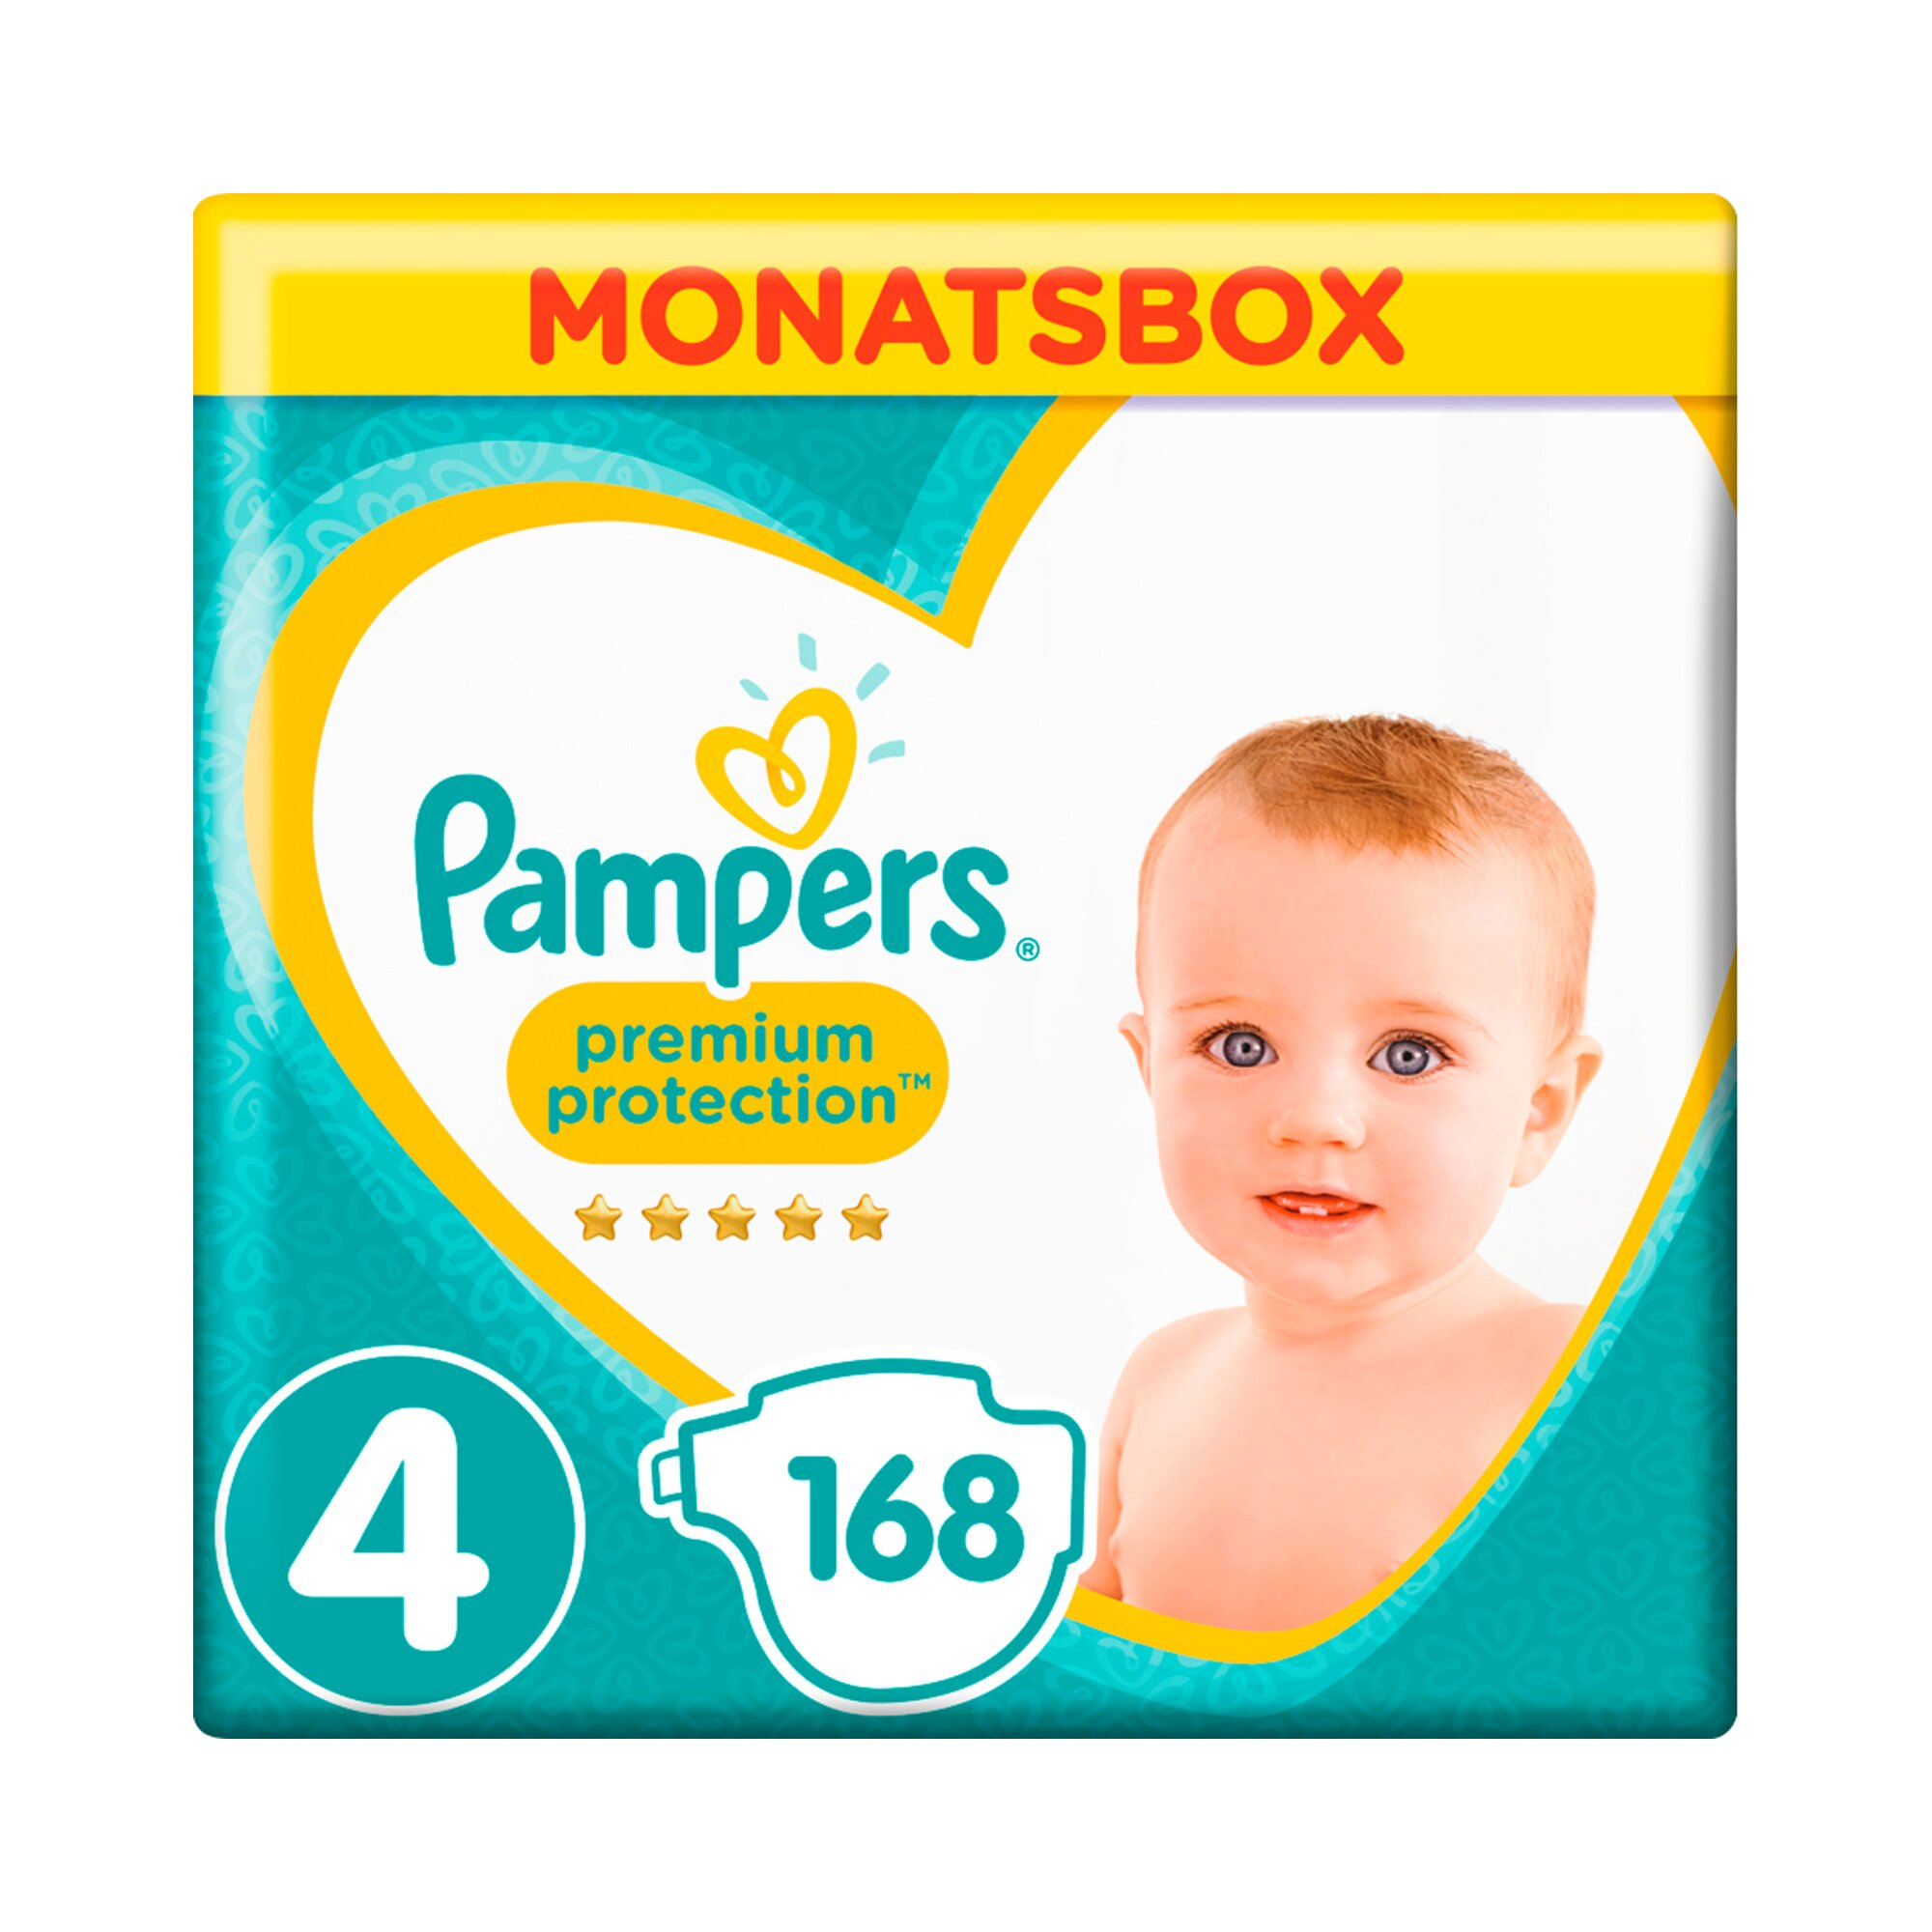 Pampers Premium Protection Windeln Gr. 4 9-14 kg Monatsbox 168 St.